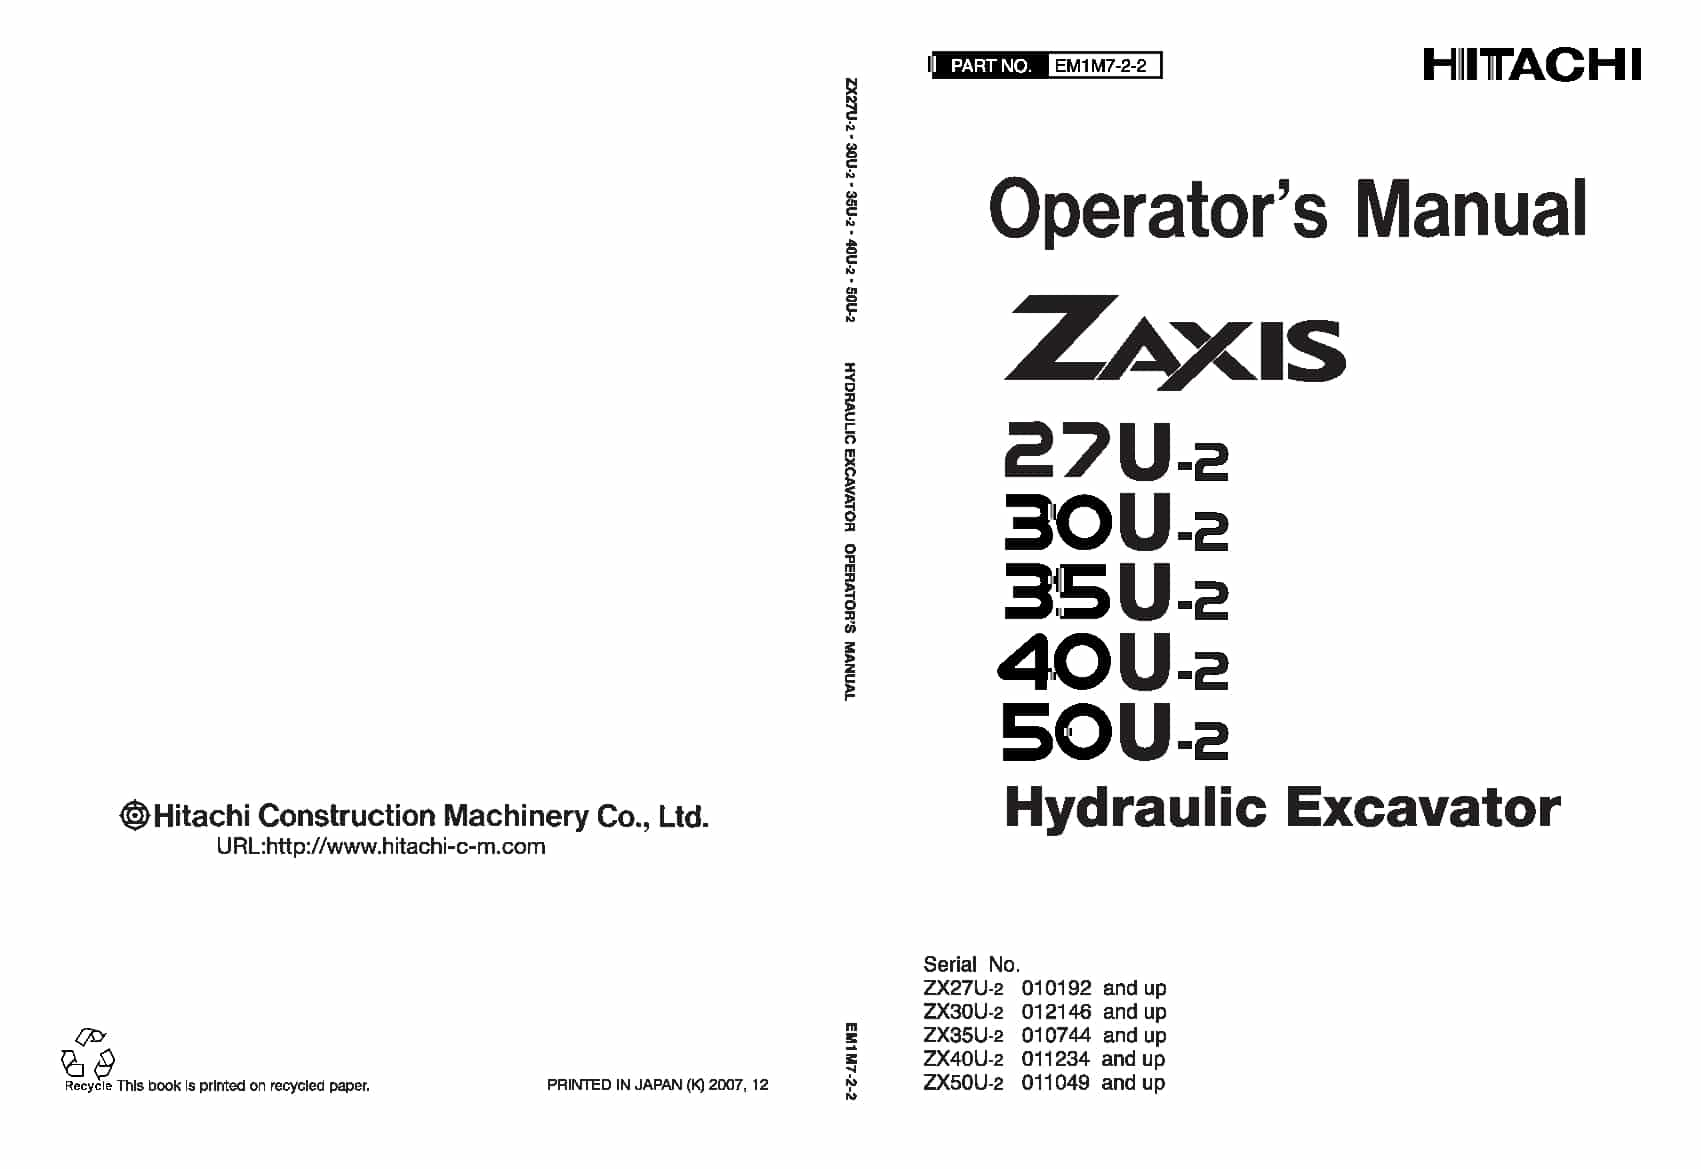 Hitachi ZX27-2 30 35 40 50U-2 Excavator Operation and